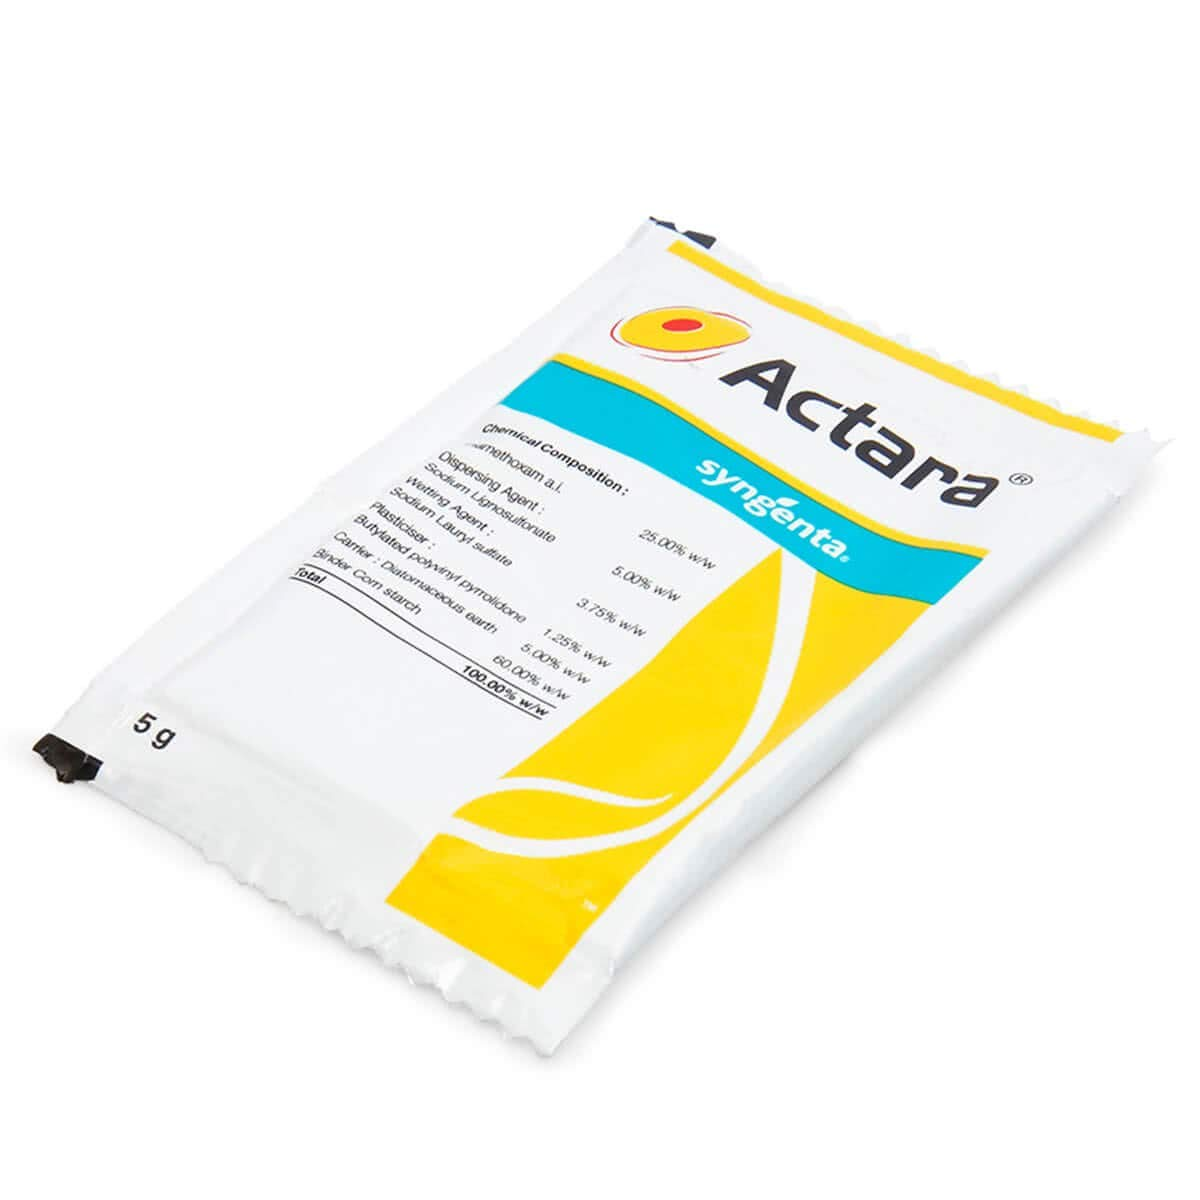 syngenta Actara 10 Nos Insect/Pest Repellent, 5 g Sachet